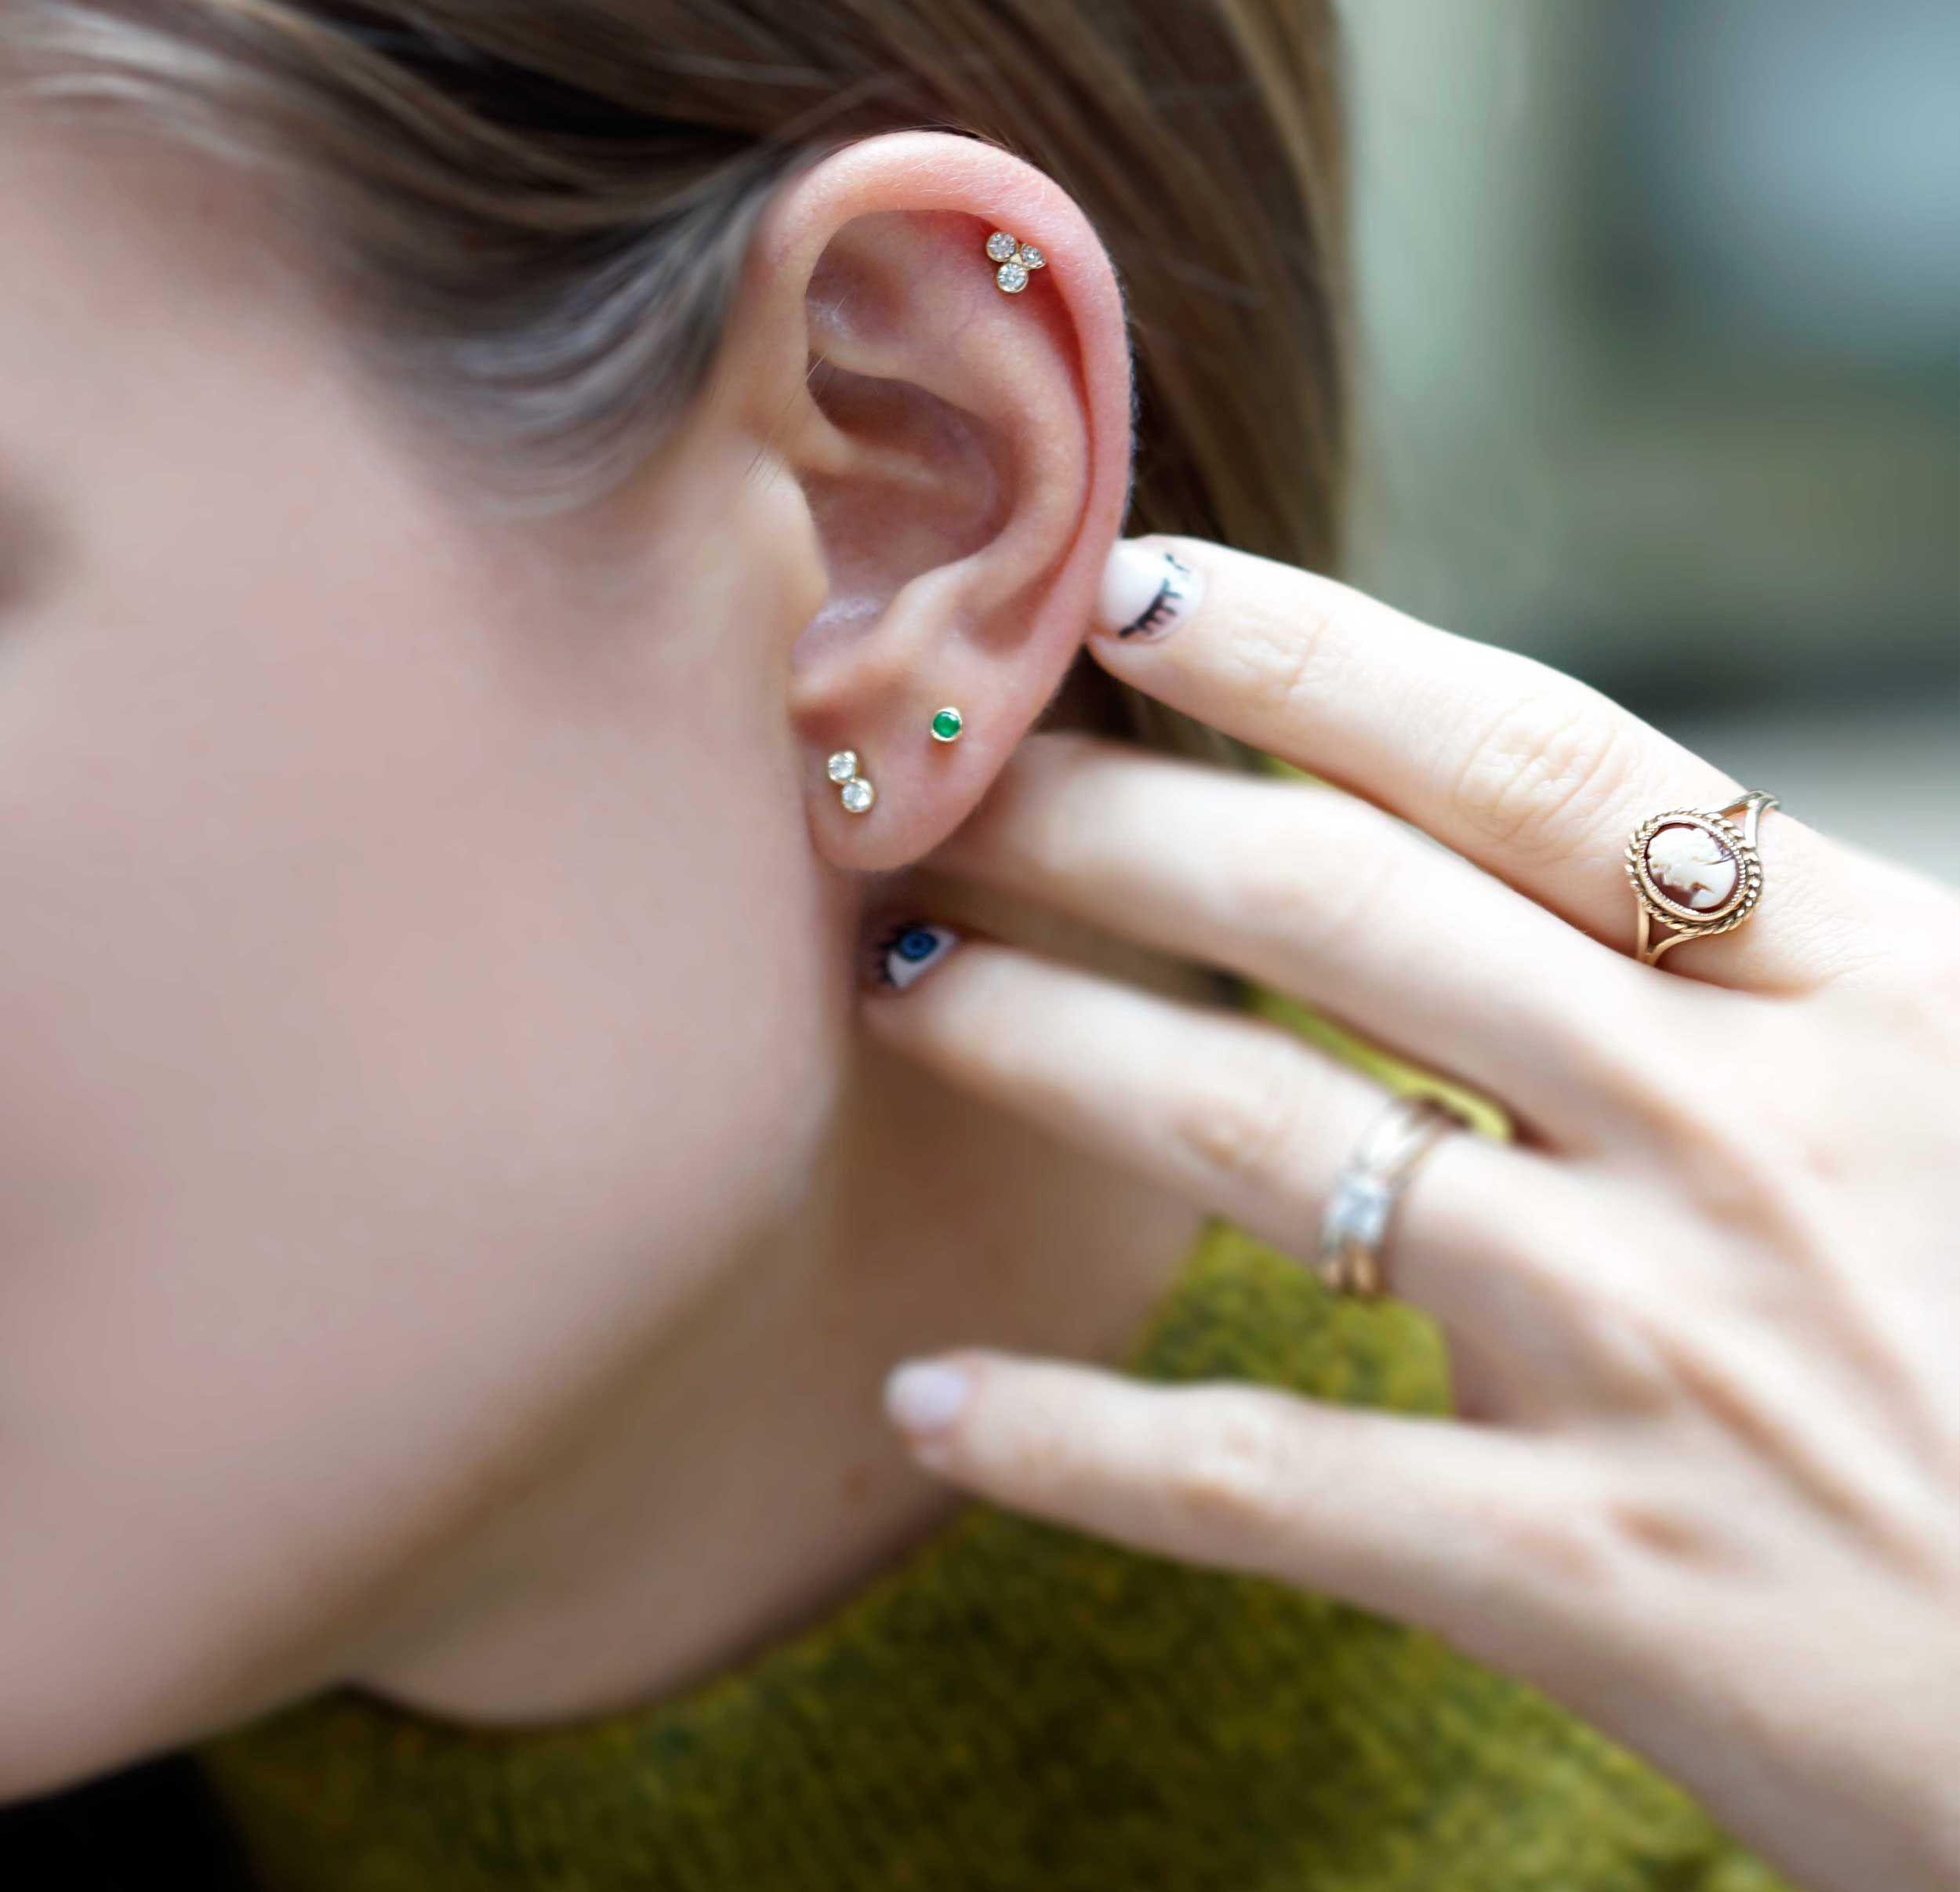 36fcec254 Double Diamond 18K Yellow Gold Cartilage Piercing Stud Medium Sizes | LENA  COHEN #piercing #piercingaddict #londonpiercing #jewellery #jewelry  #fashion ...